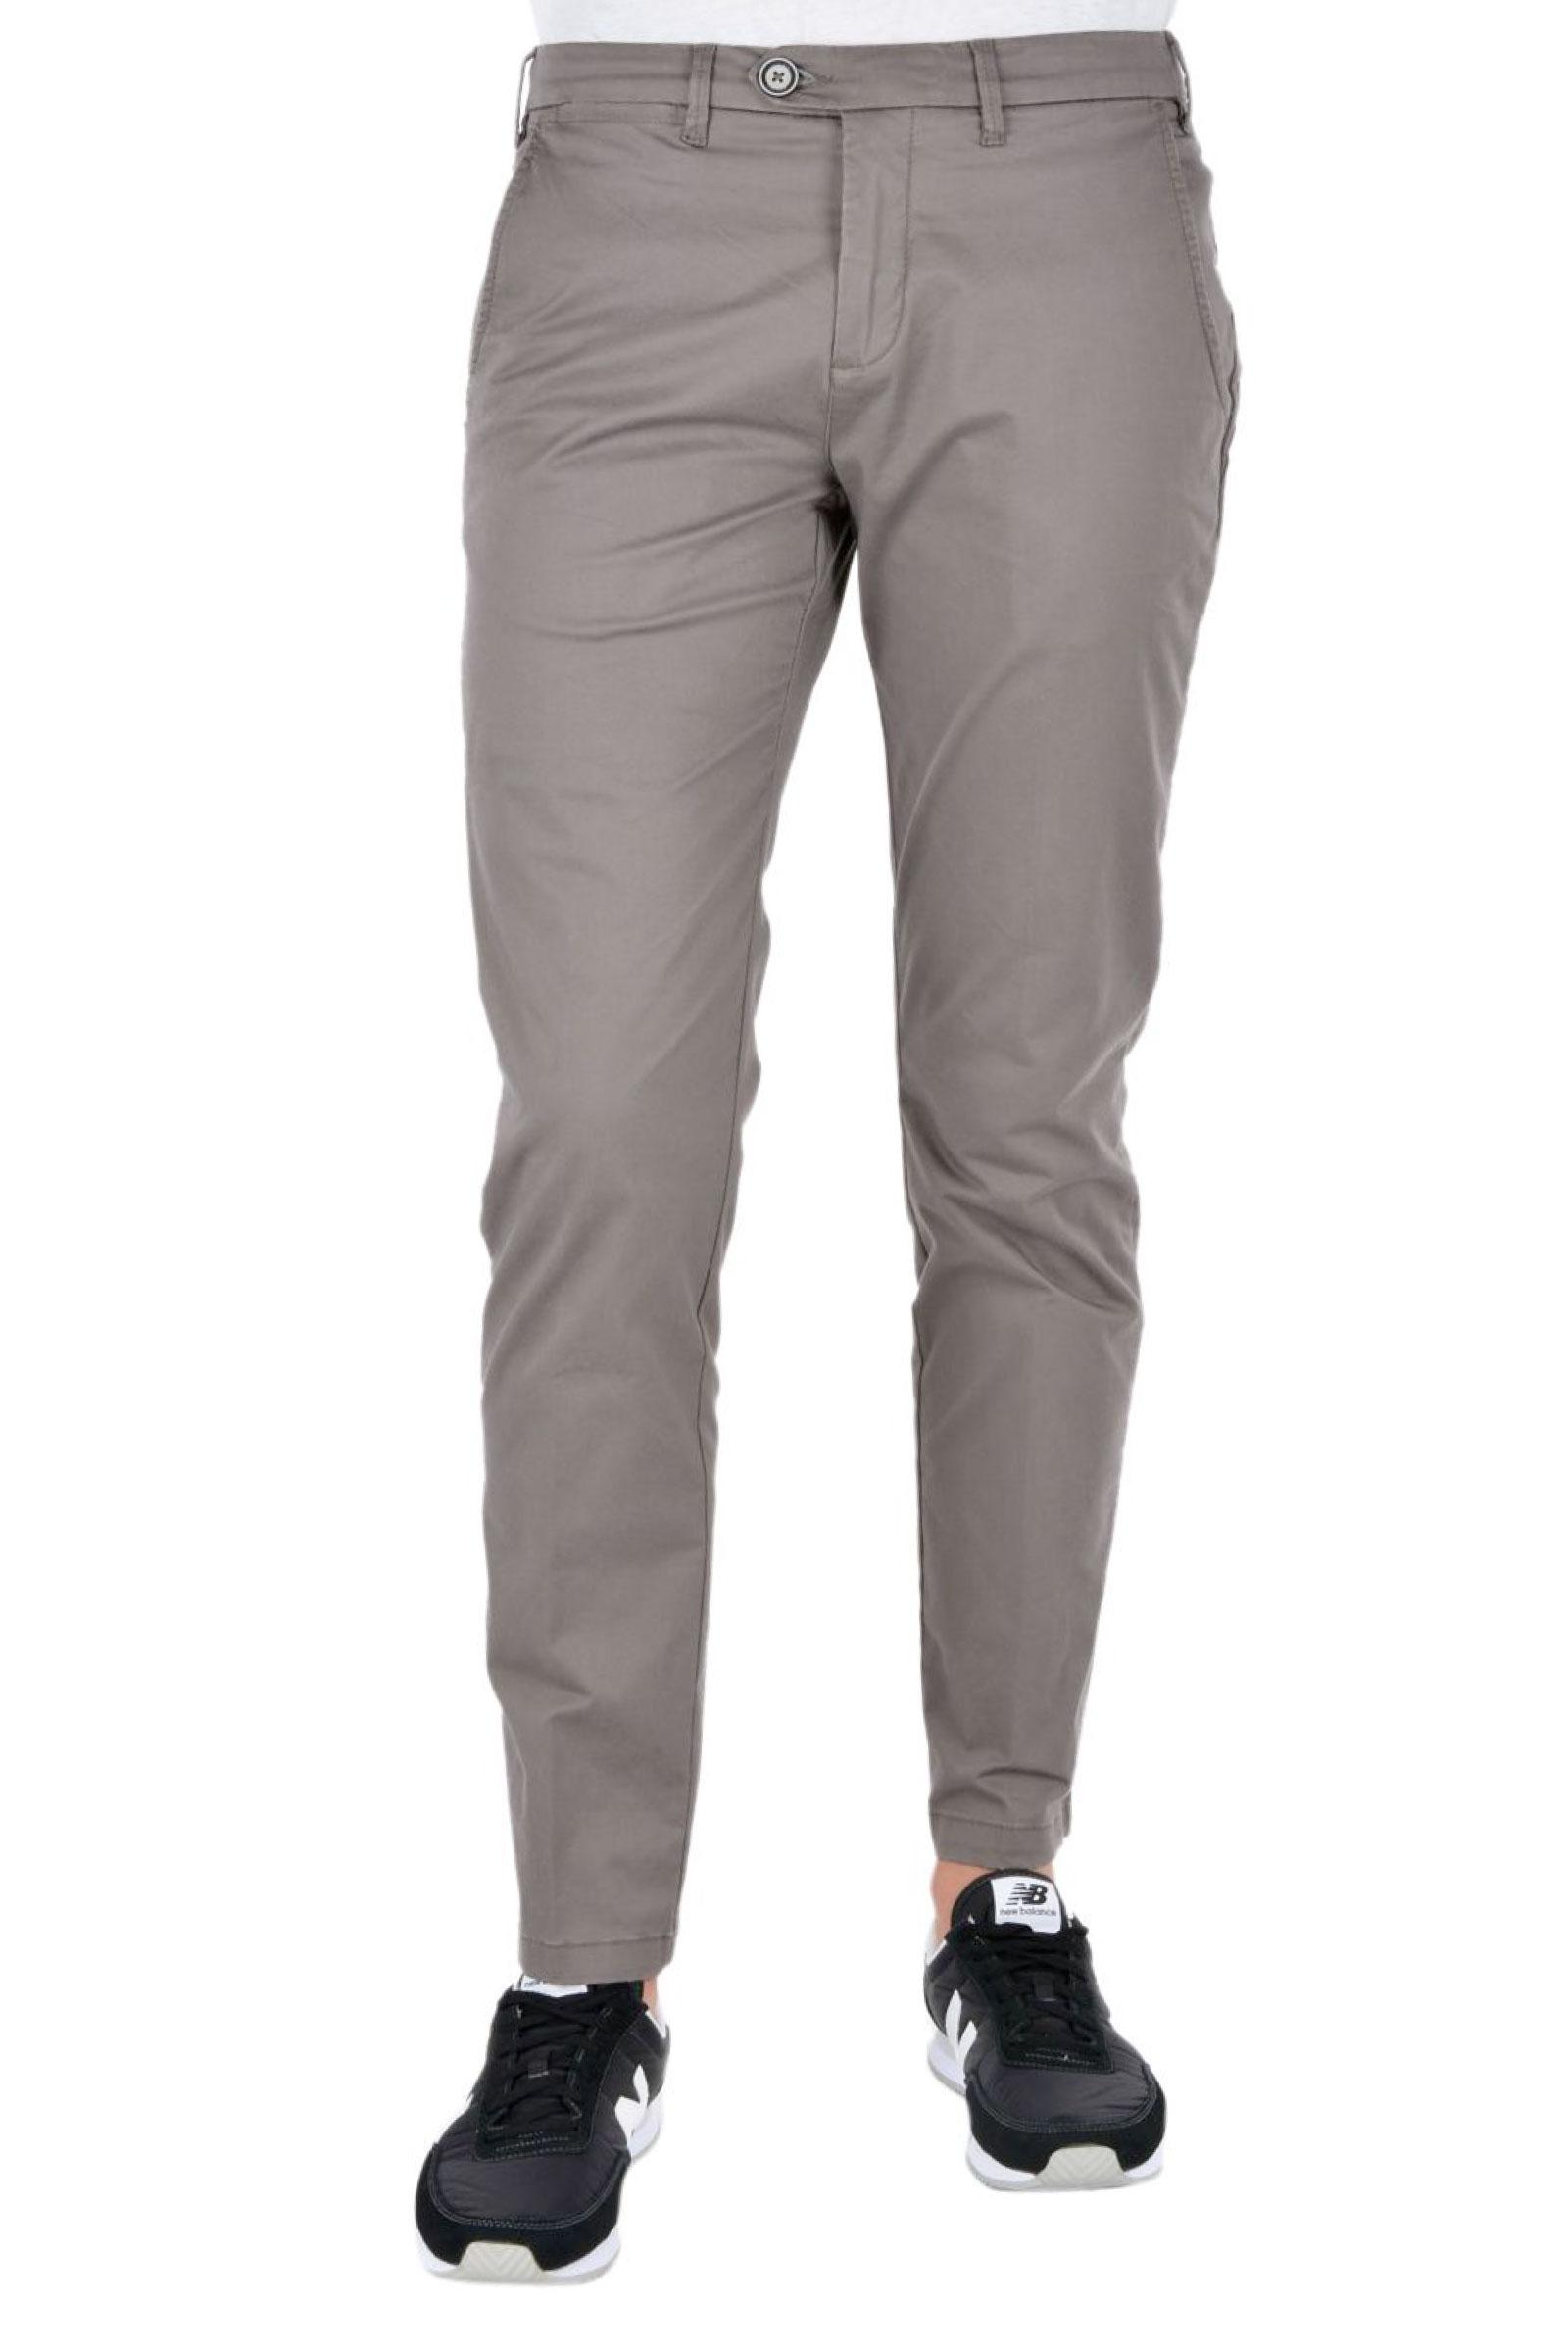 Pantalone Uomo YES.ZEE | Pantalone | P640 PL000809